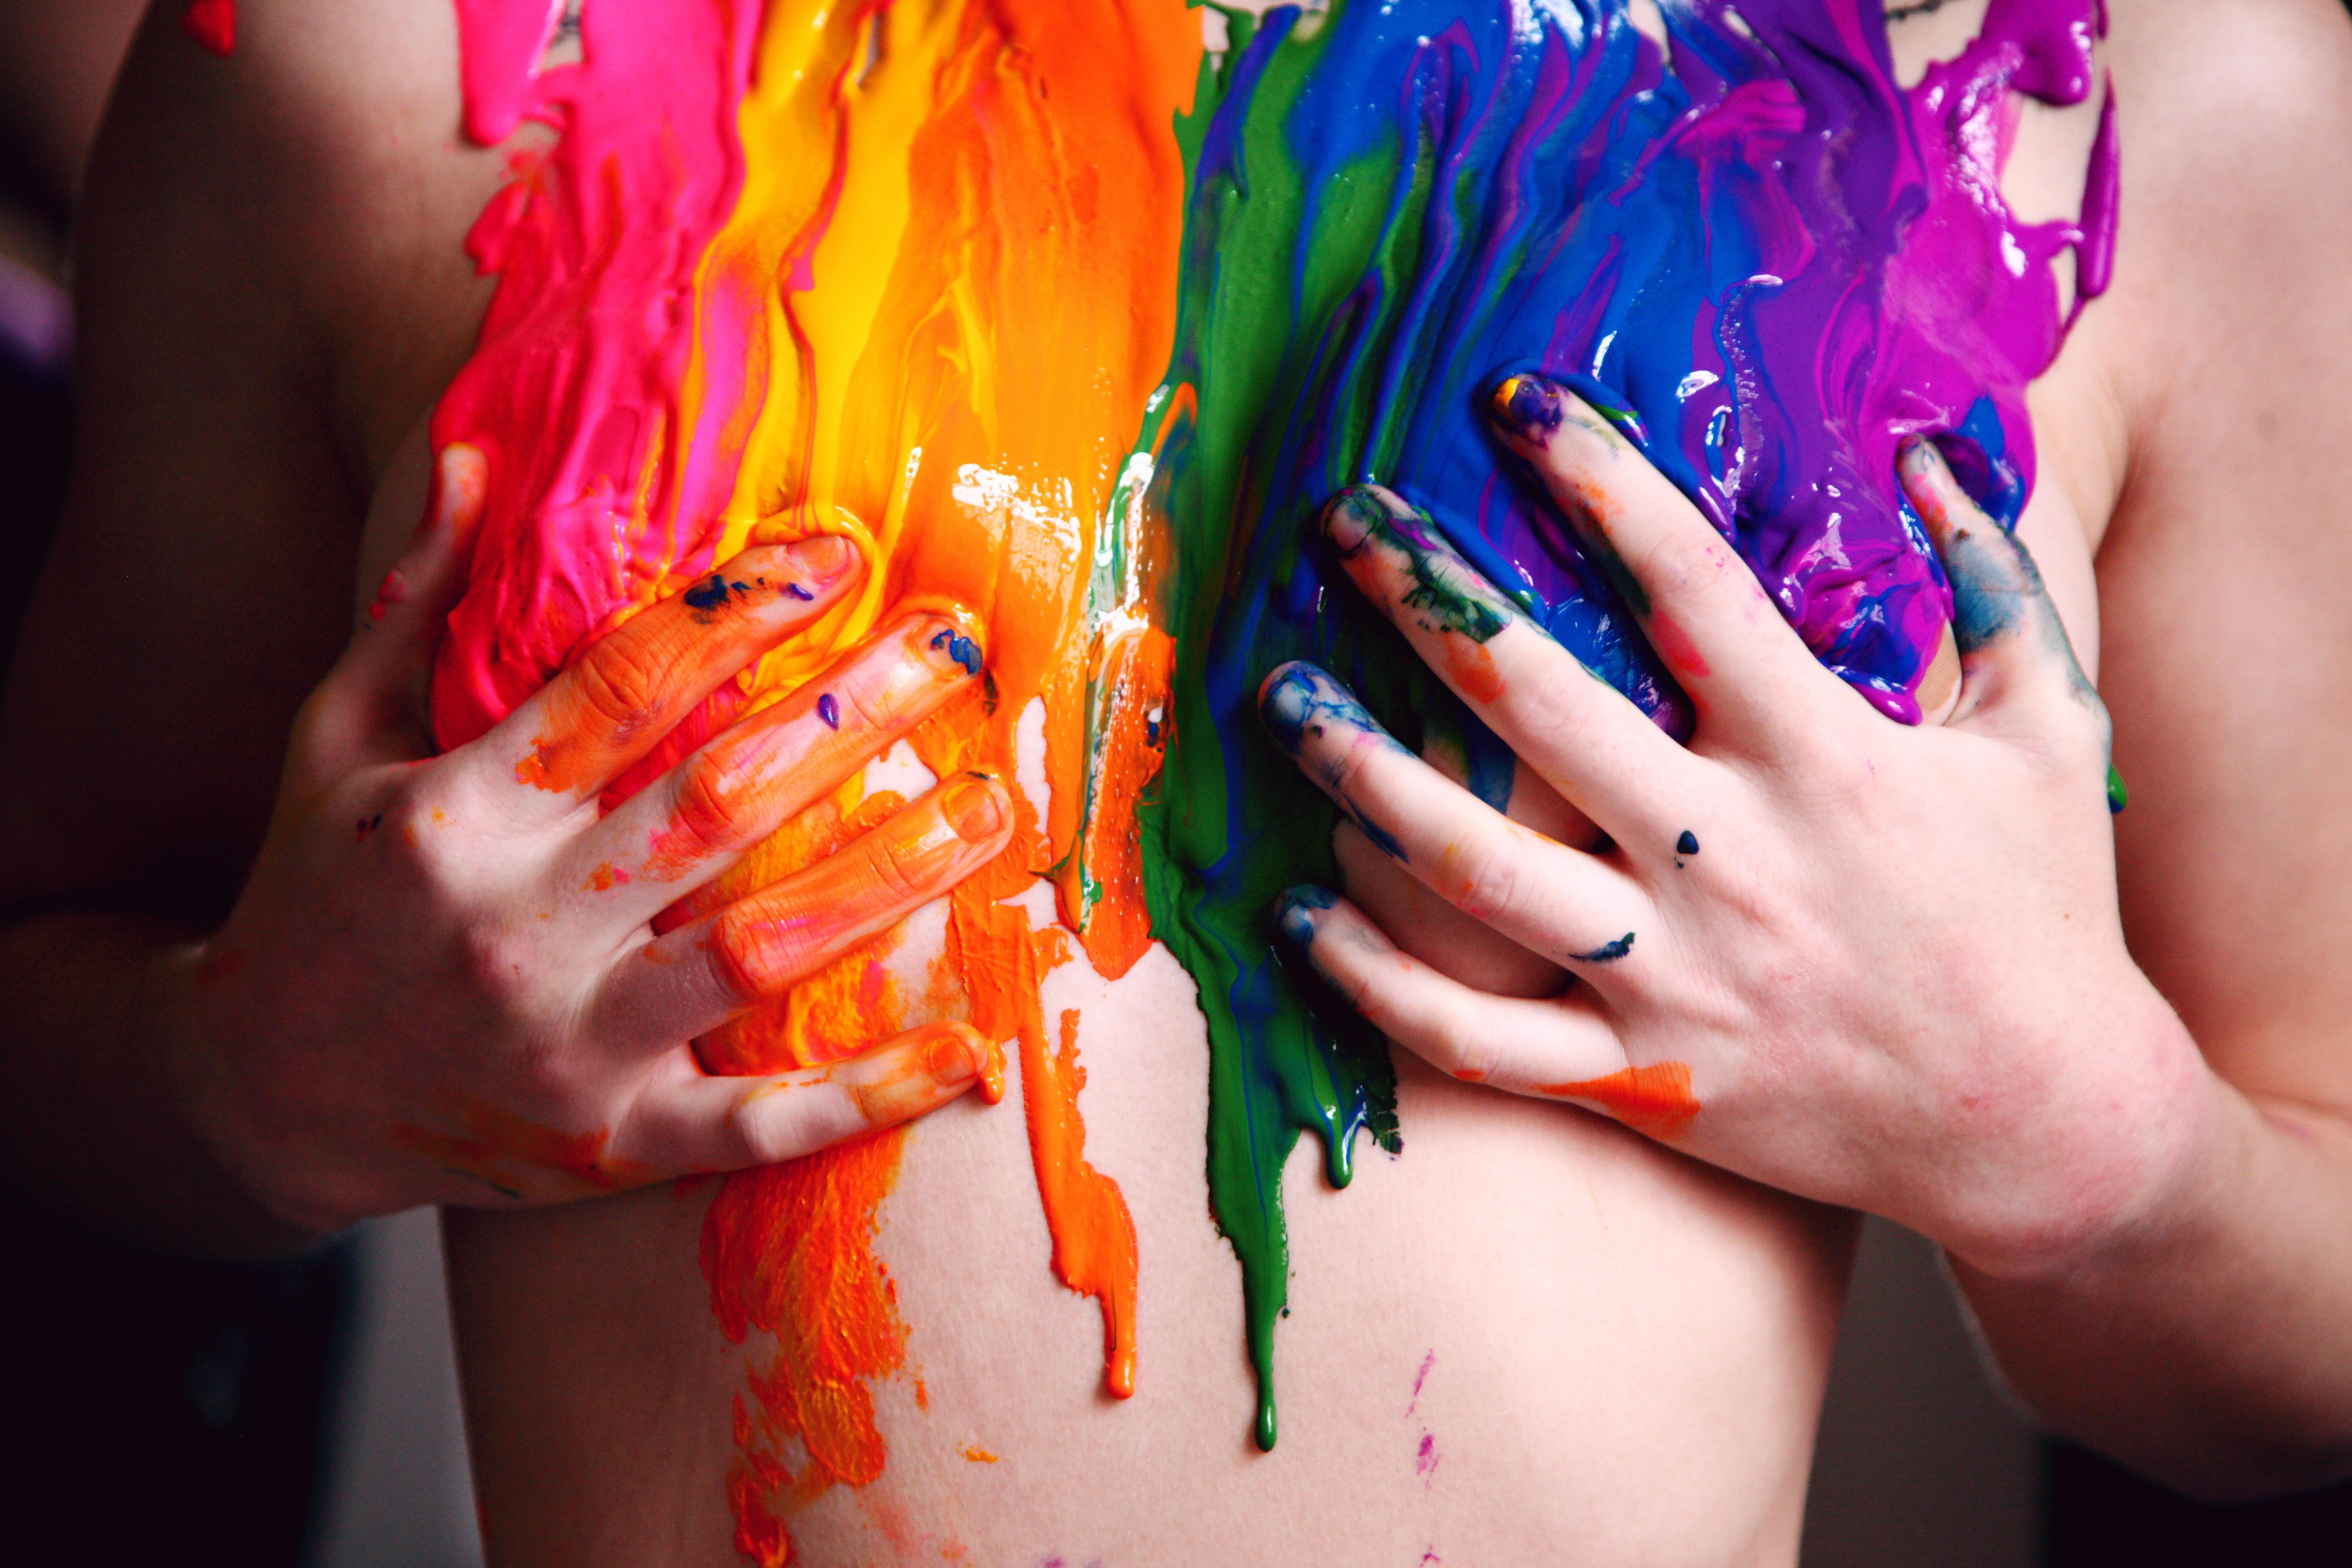 LGBTQ pride paint photoshoot